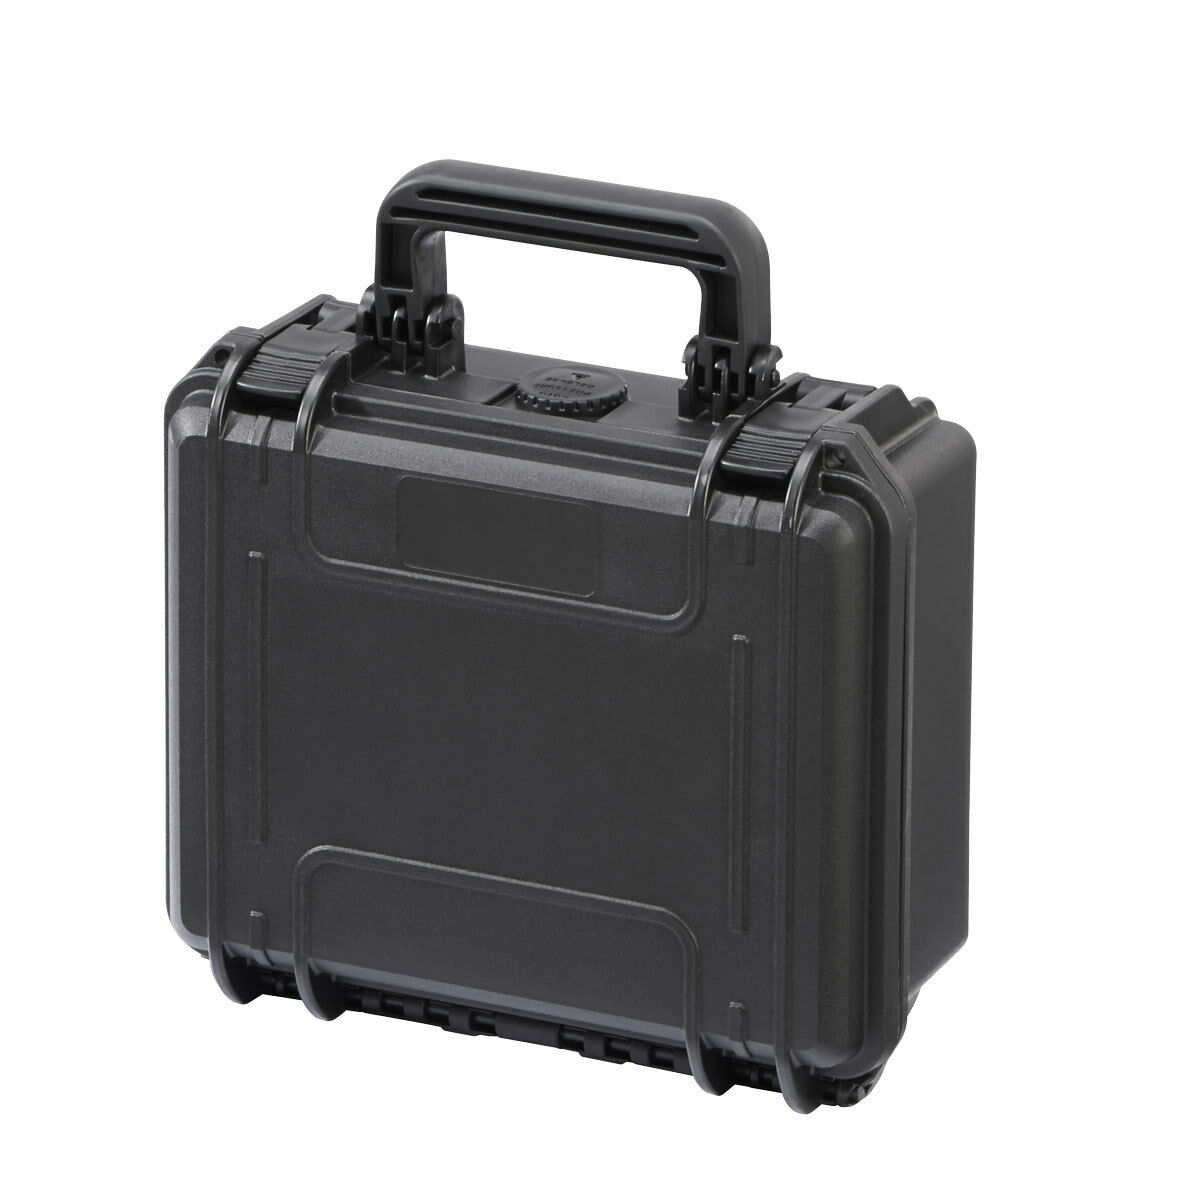 Waterproof Water Tight Camera Tool Gear Hard Case Box MAX235H105 w/ Foam Black